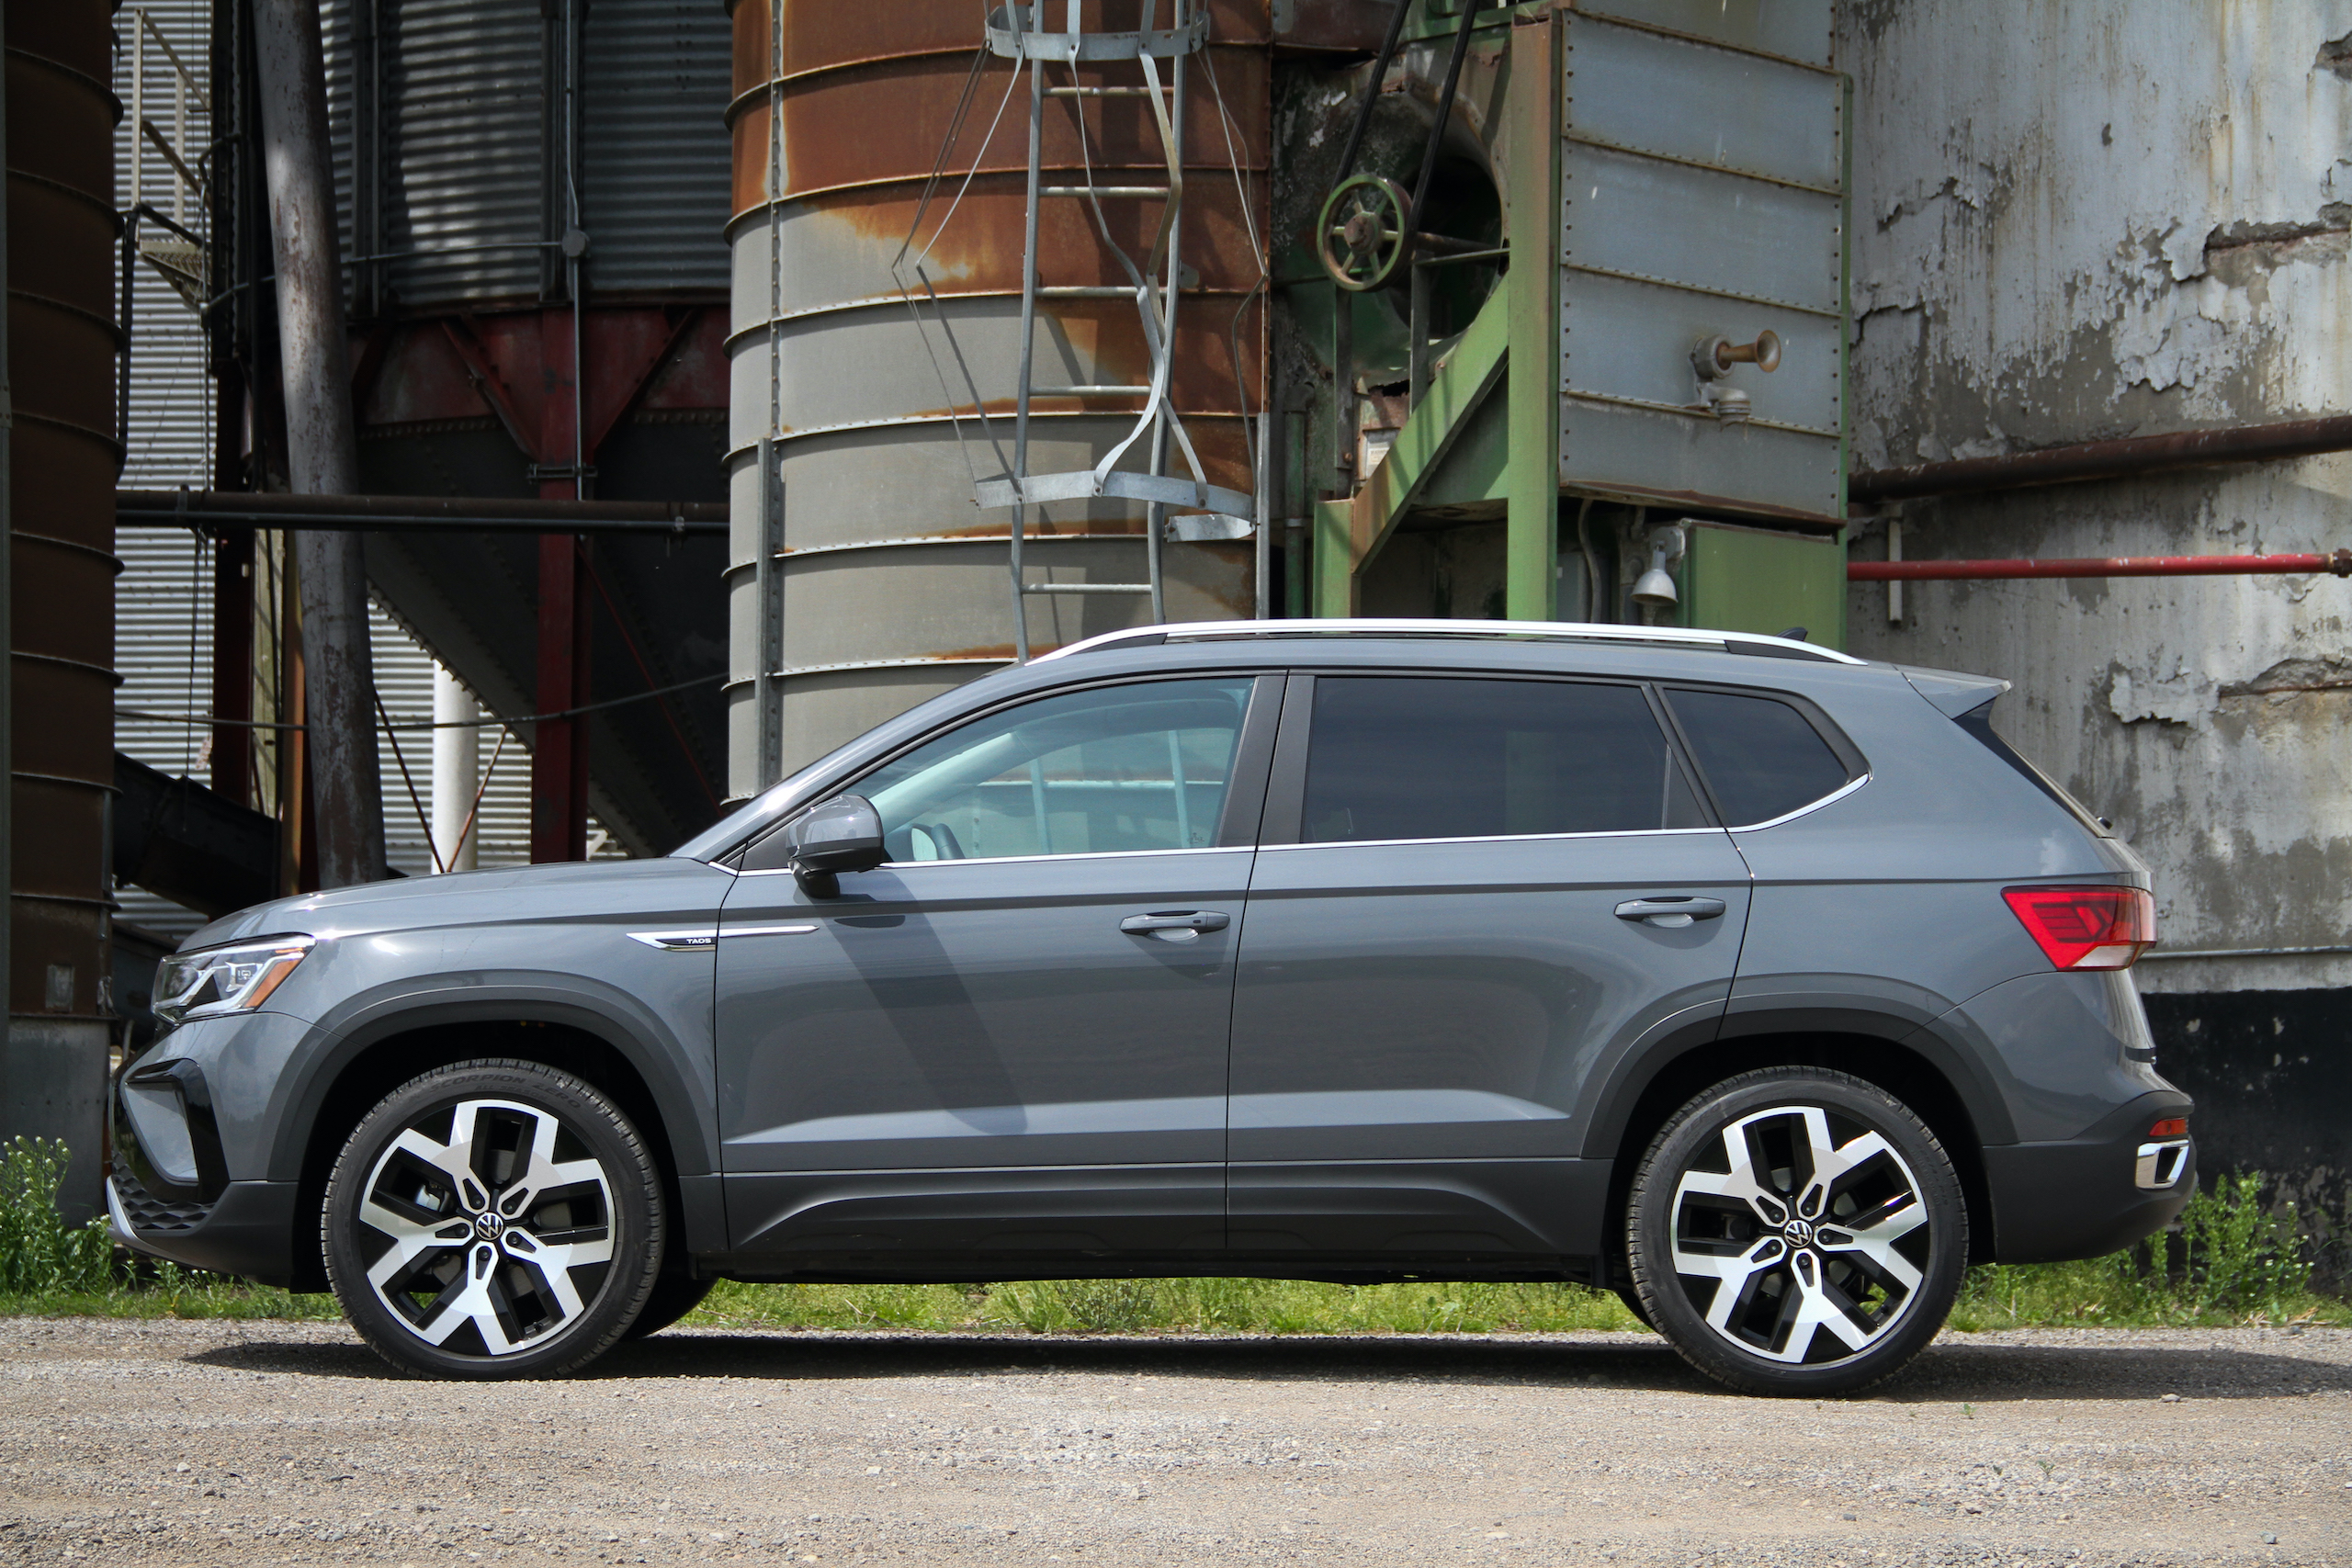 2022 Volkswagen Taos SEL AWD side profile low